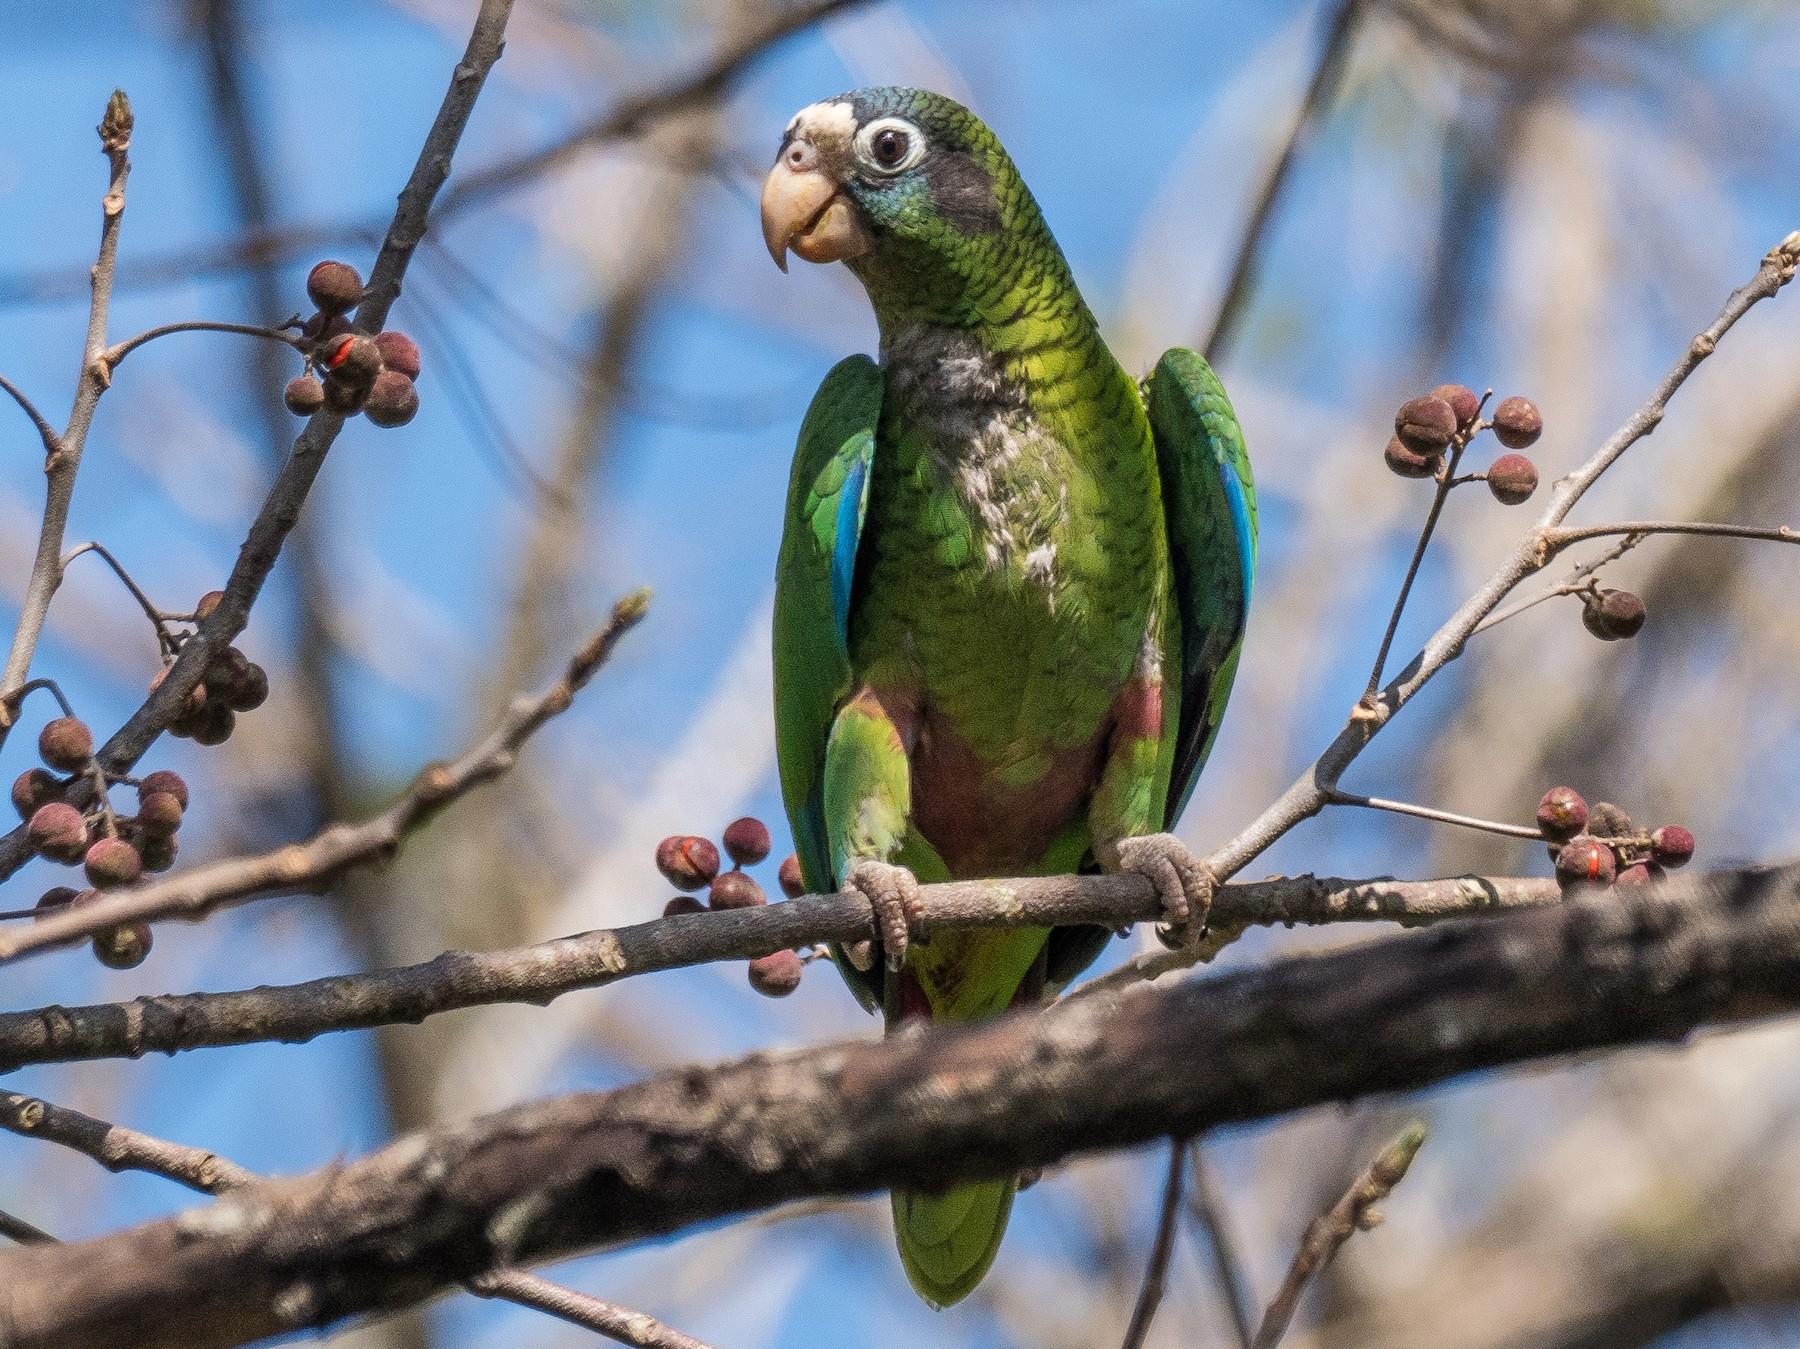 Hispaniolan Parrot - James Moore